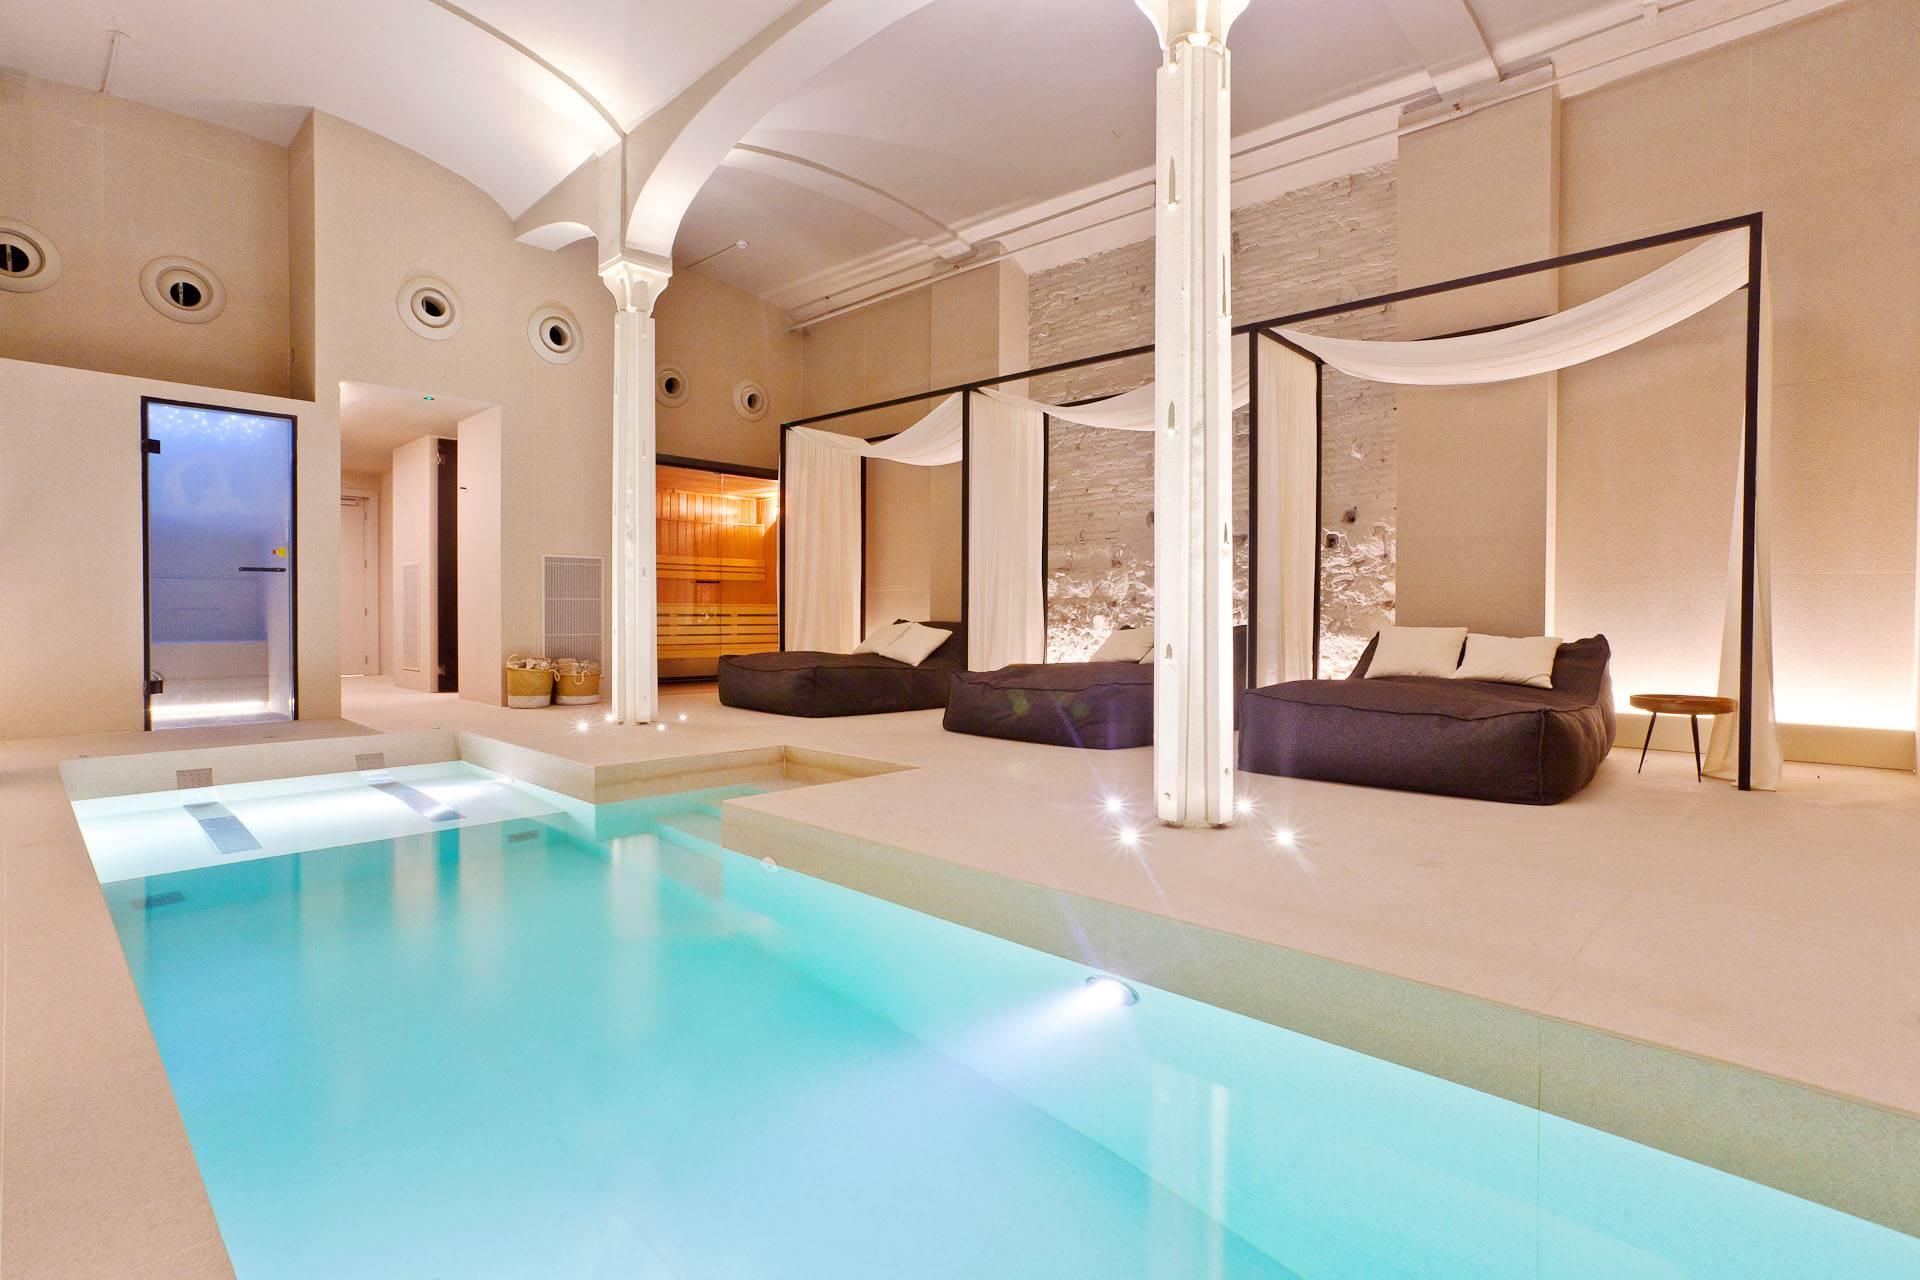 Su piscina climatizada.